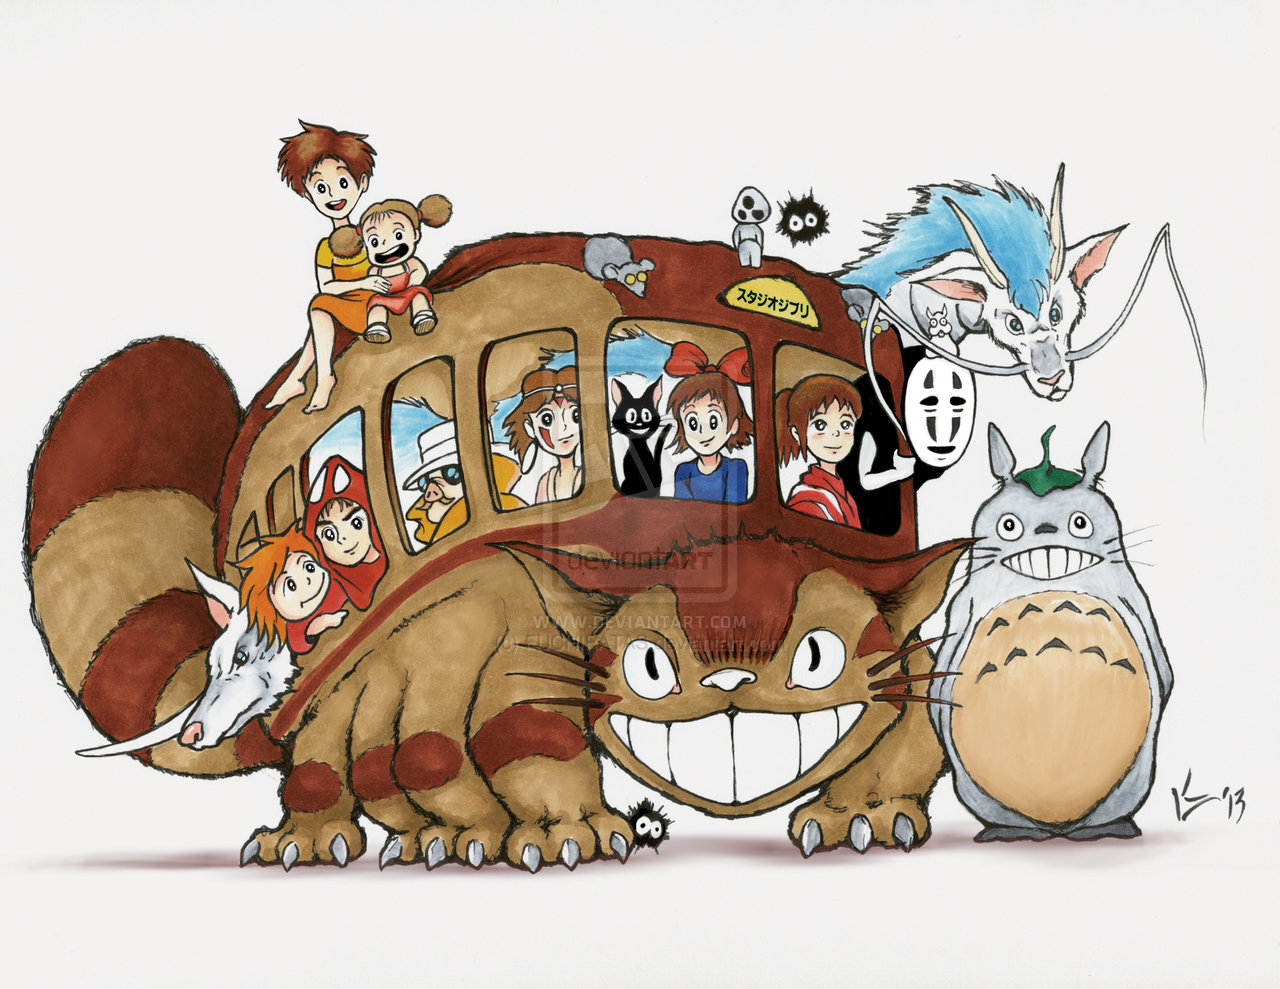 Catbus Fanart  Drawing And Art From My Neighbor Totoro